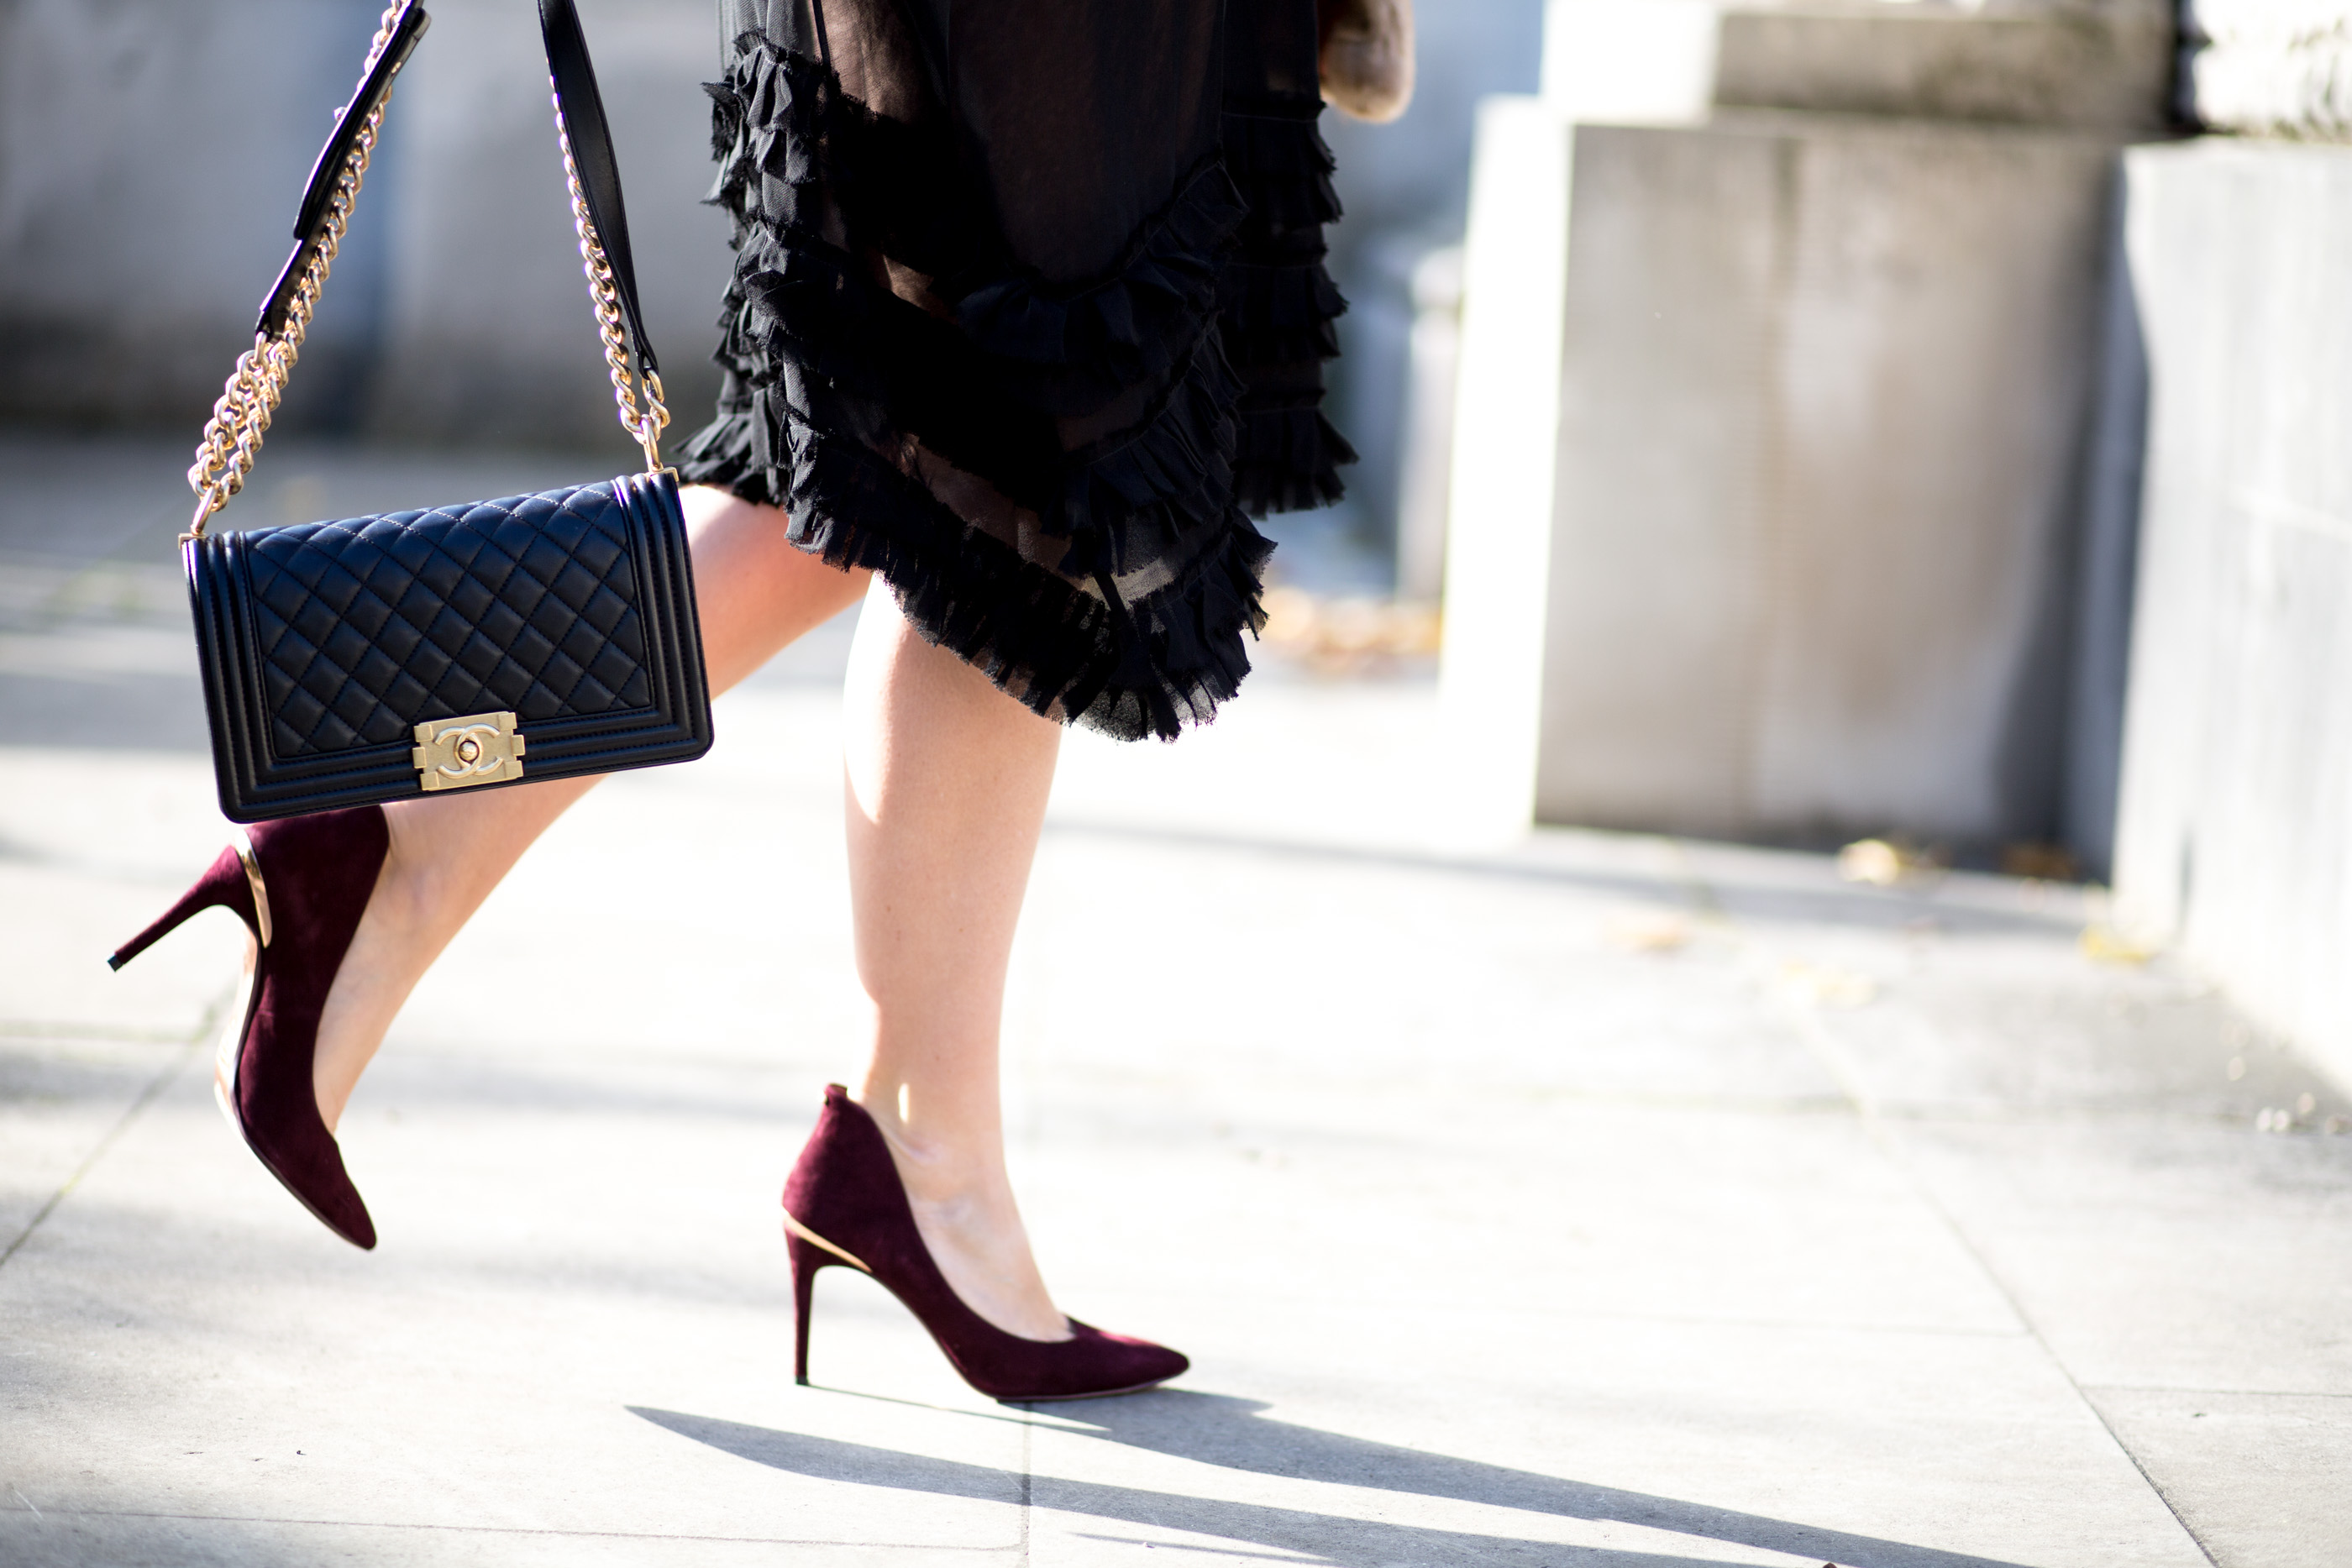 ted baker savvy burgundy court shoes, selfridges, mediamarmalade